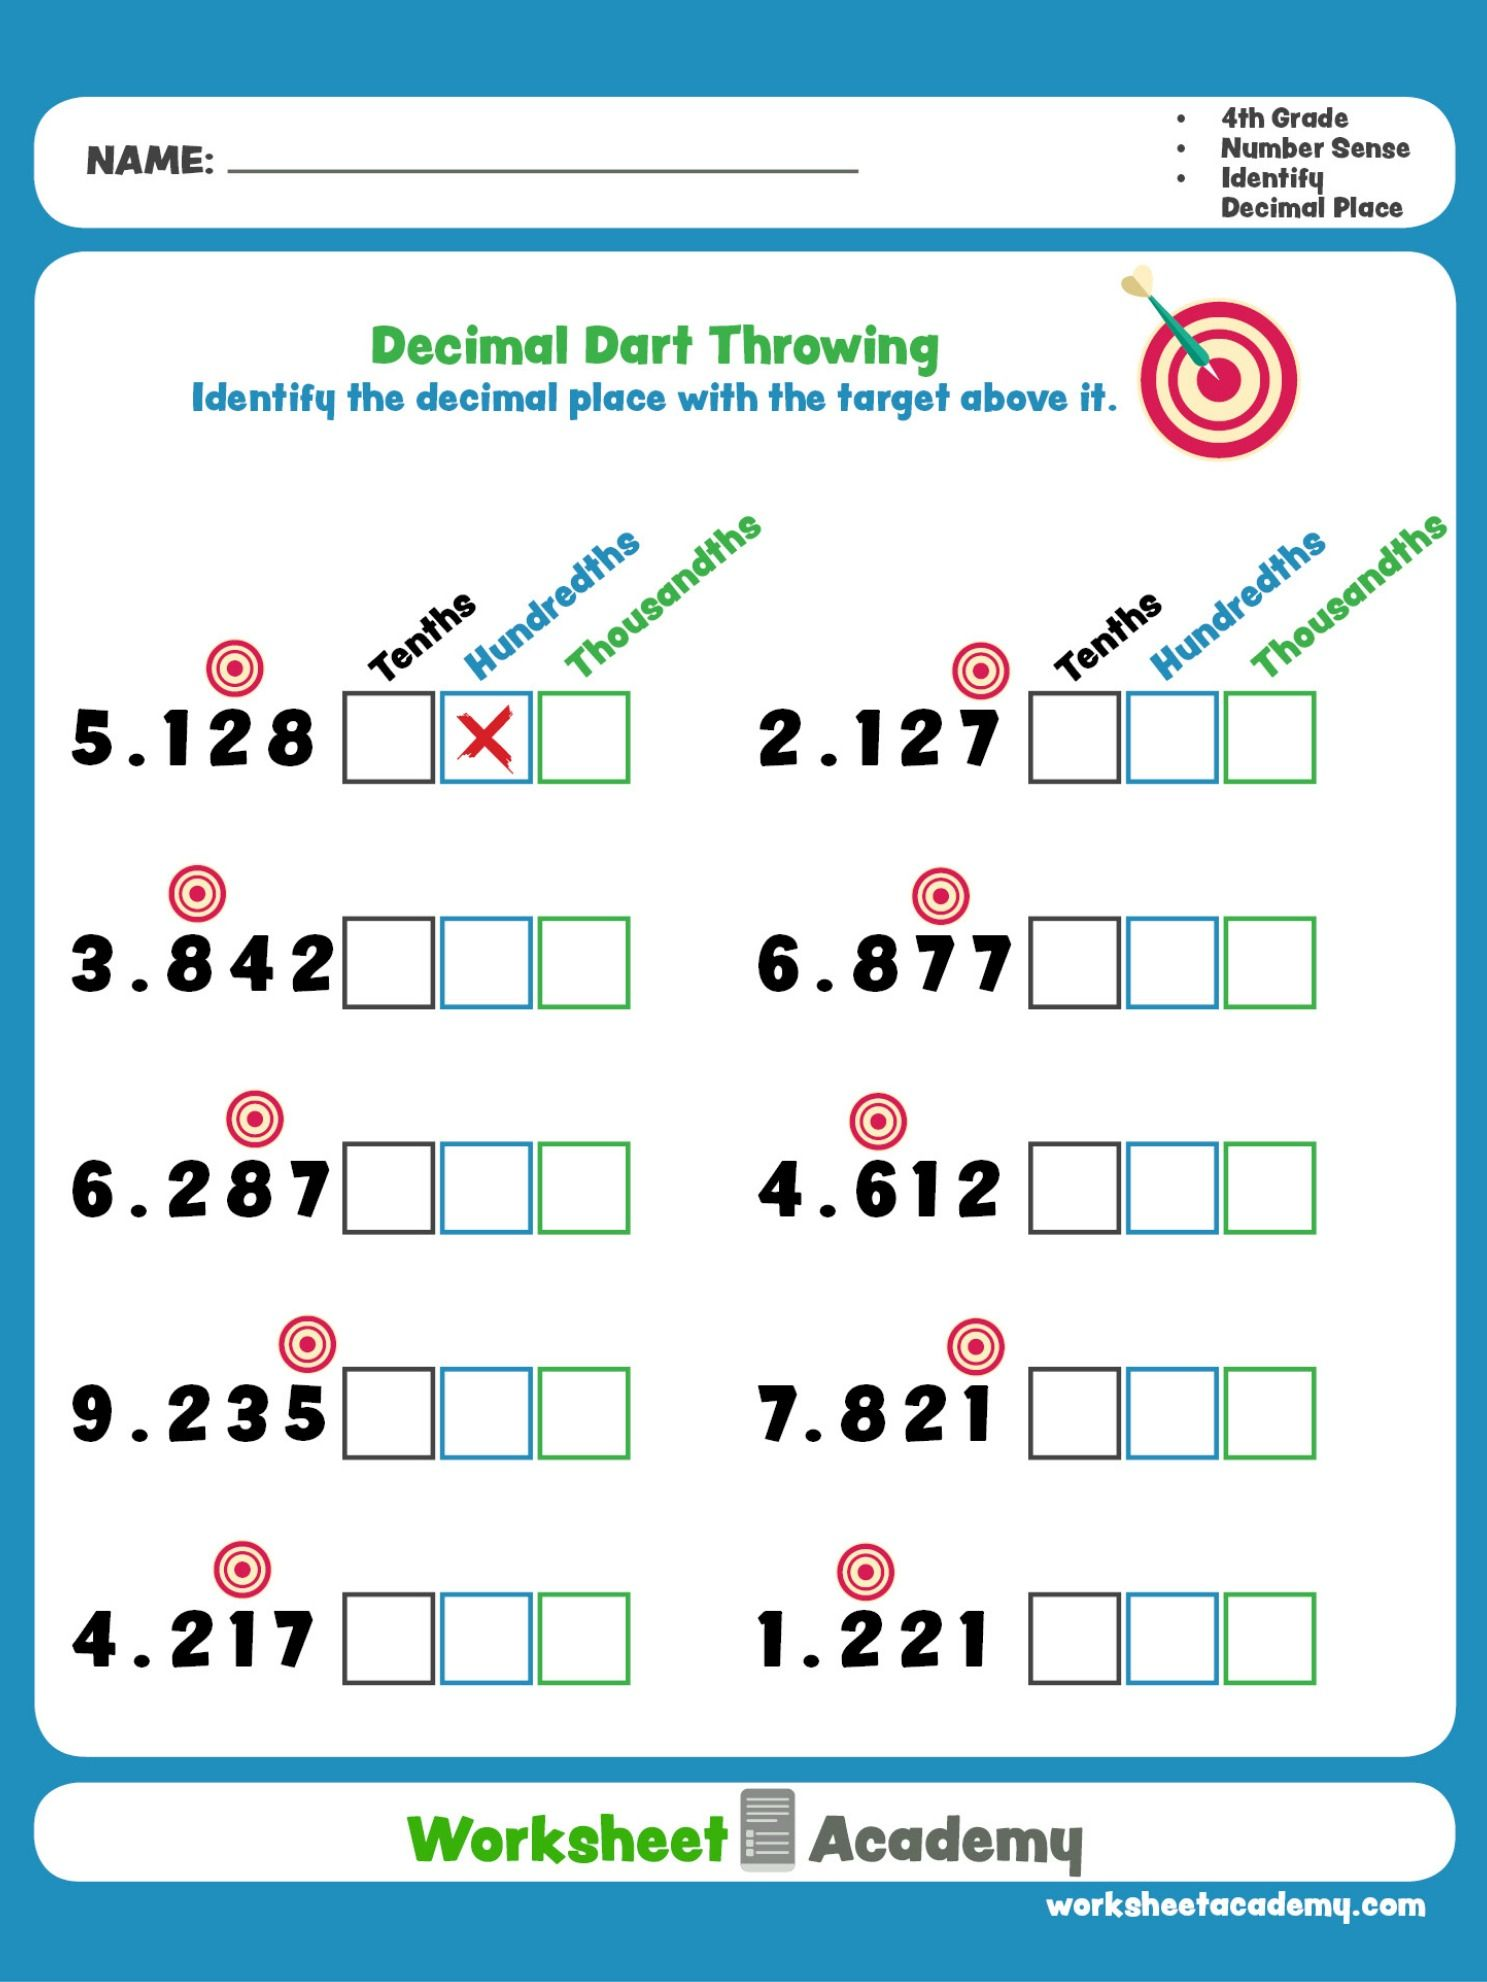 Decimal Dart Throwing